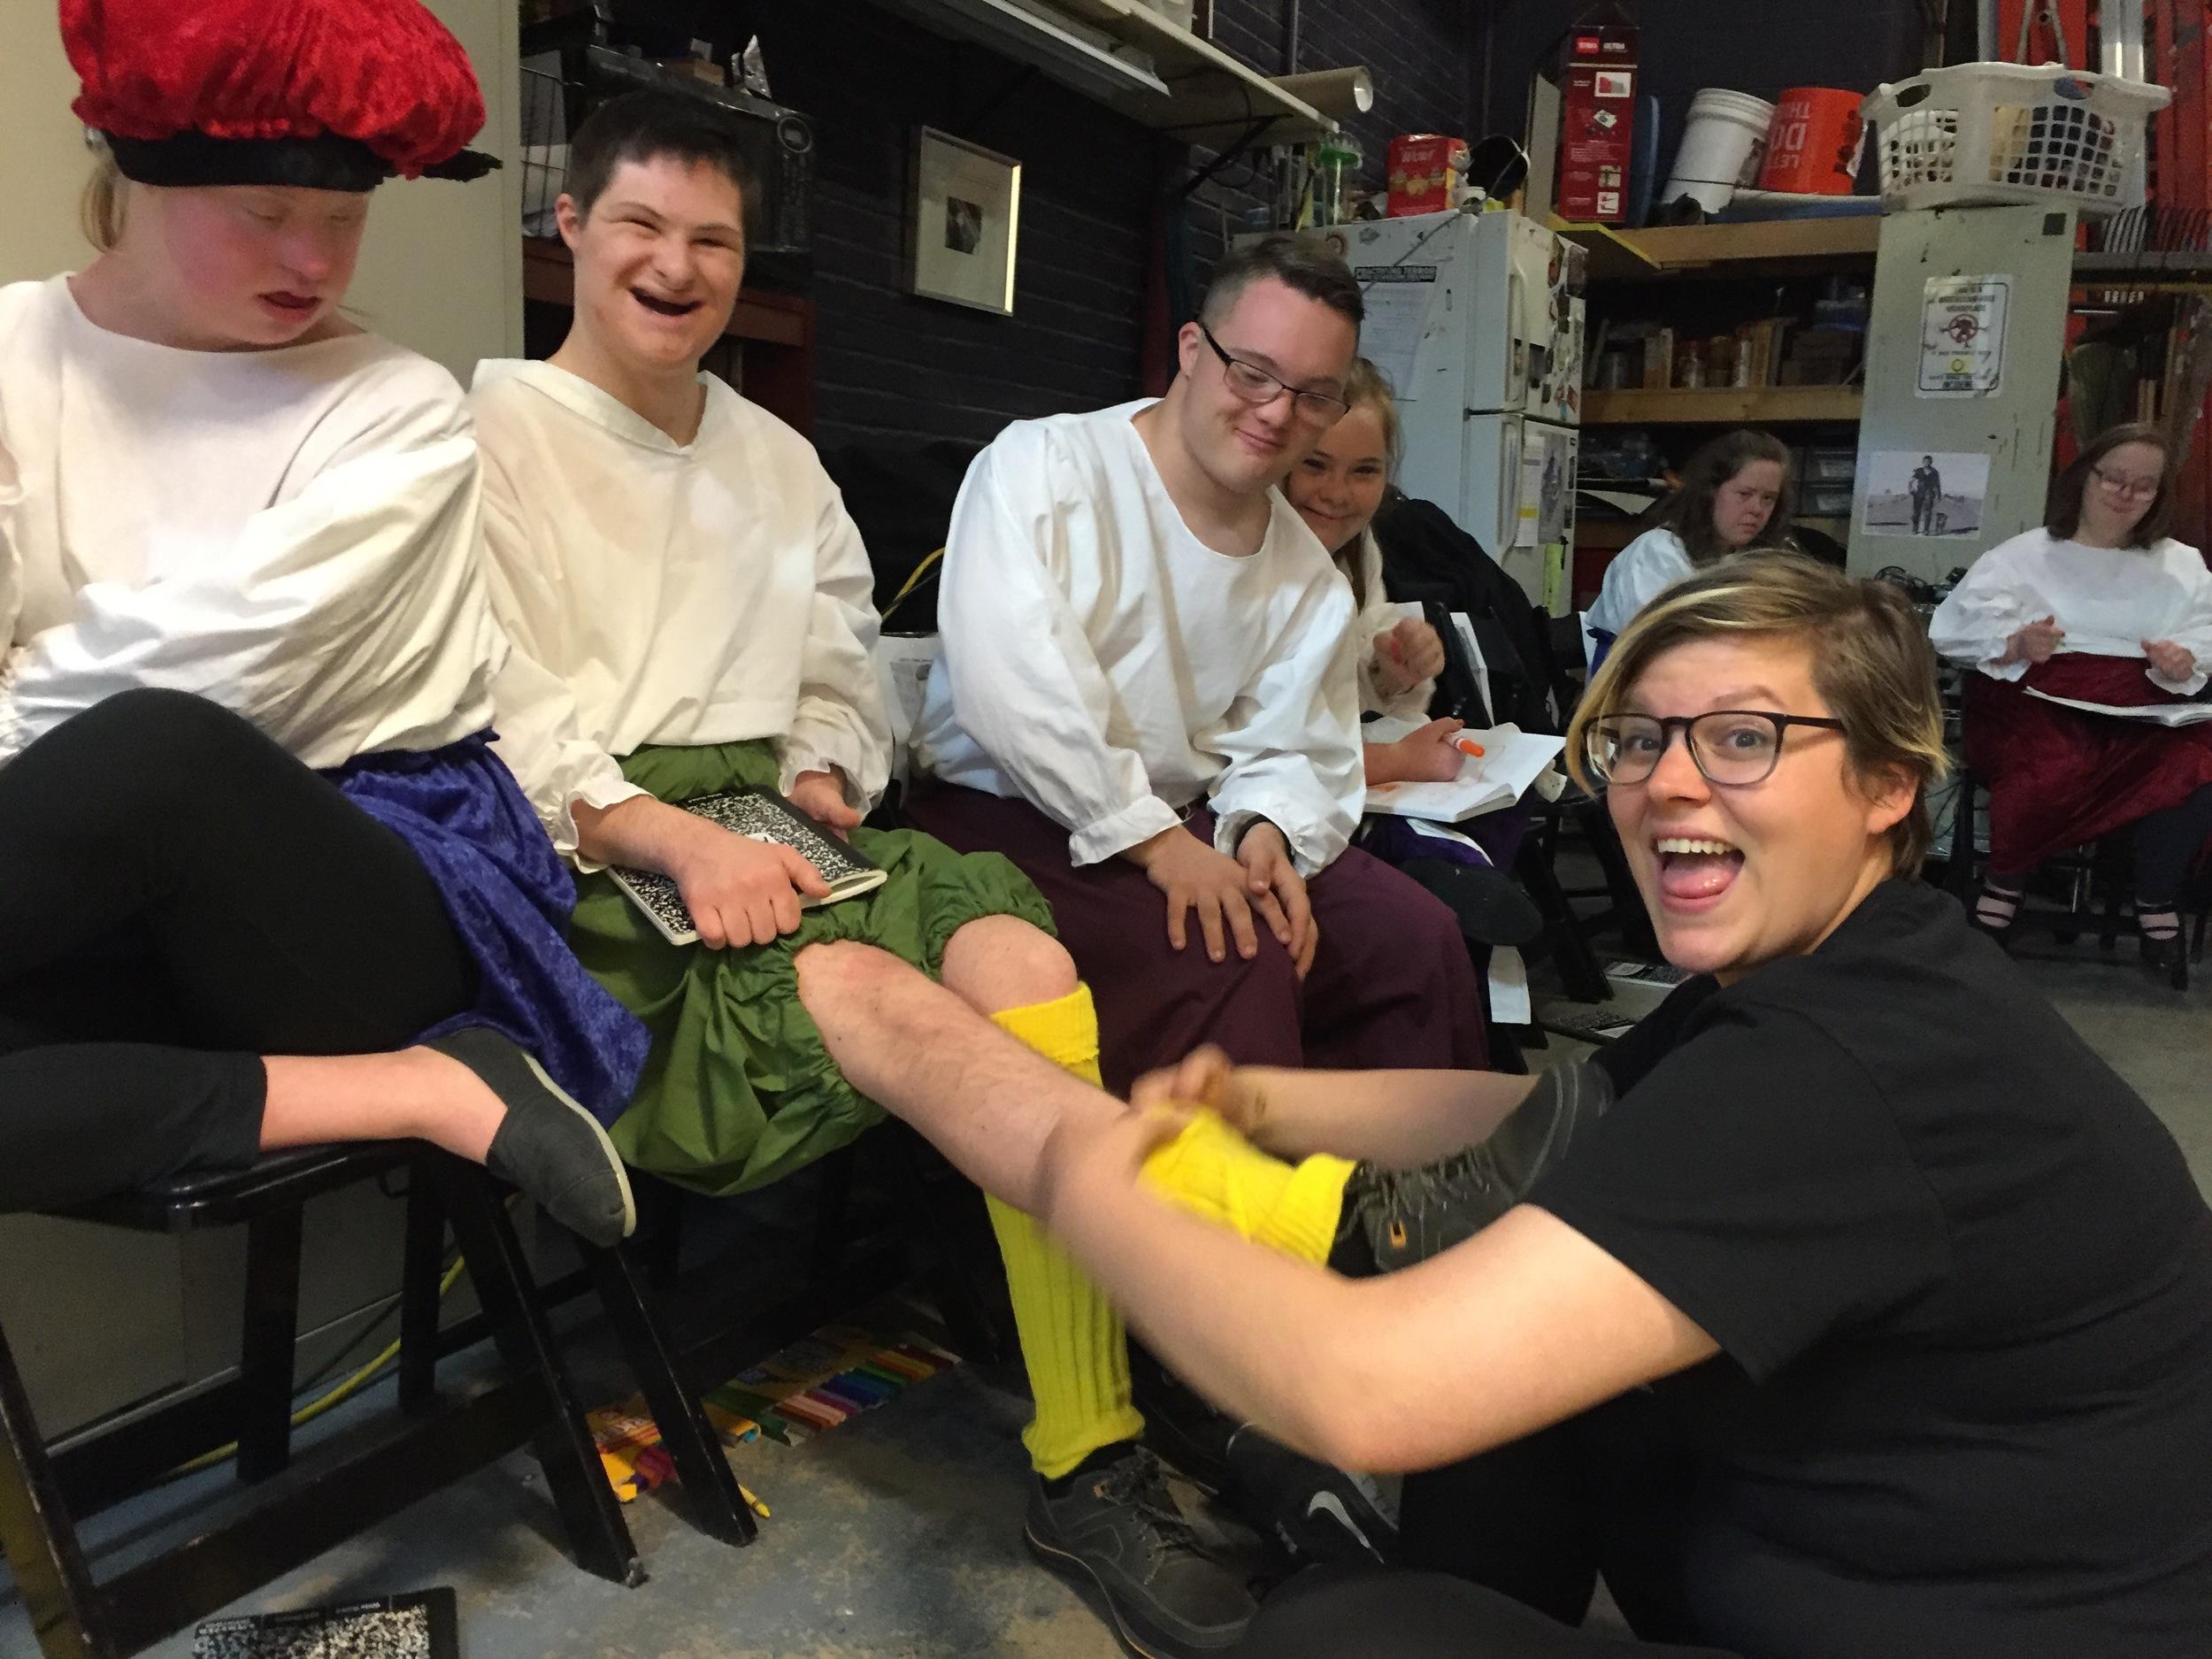 Malvolio putting on his stockings!